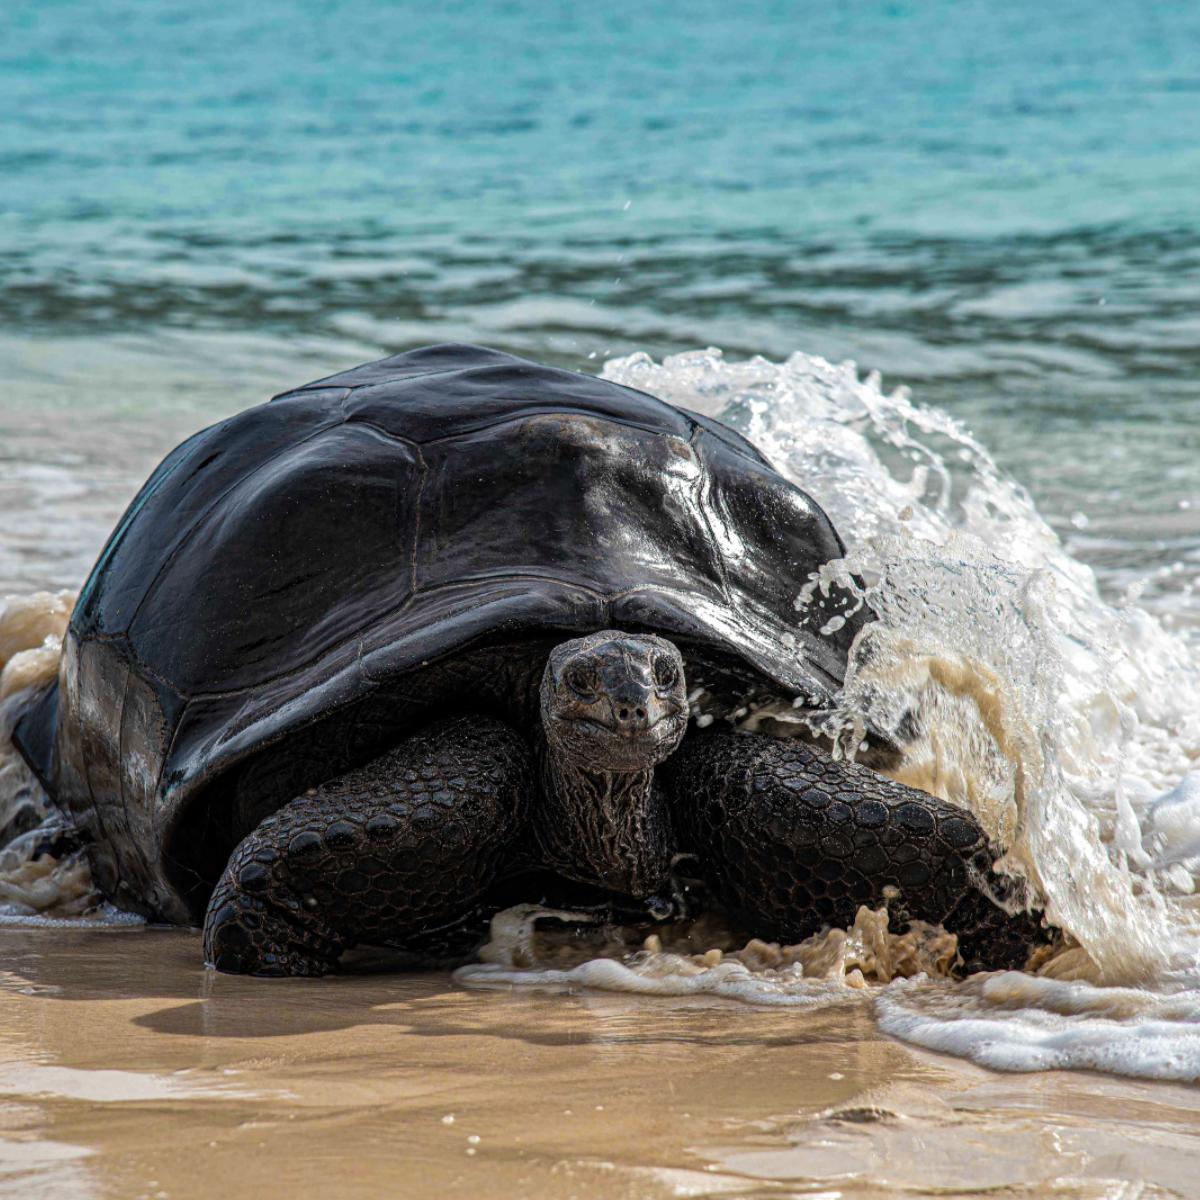 69-Tortue Aldabra, seychelles Studio Ponant-Servane Roy Berton